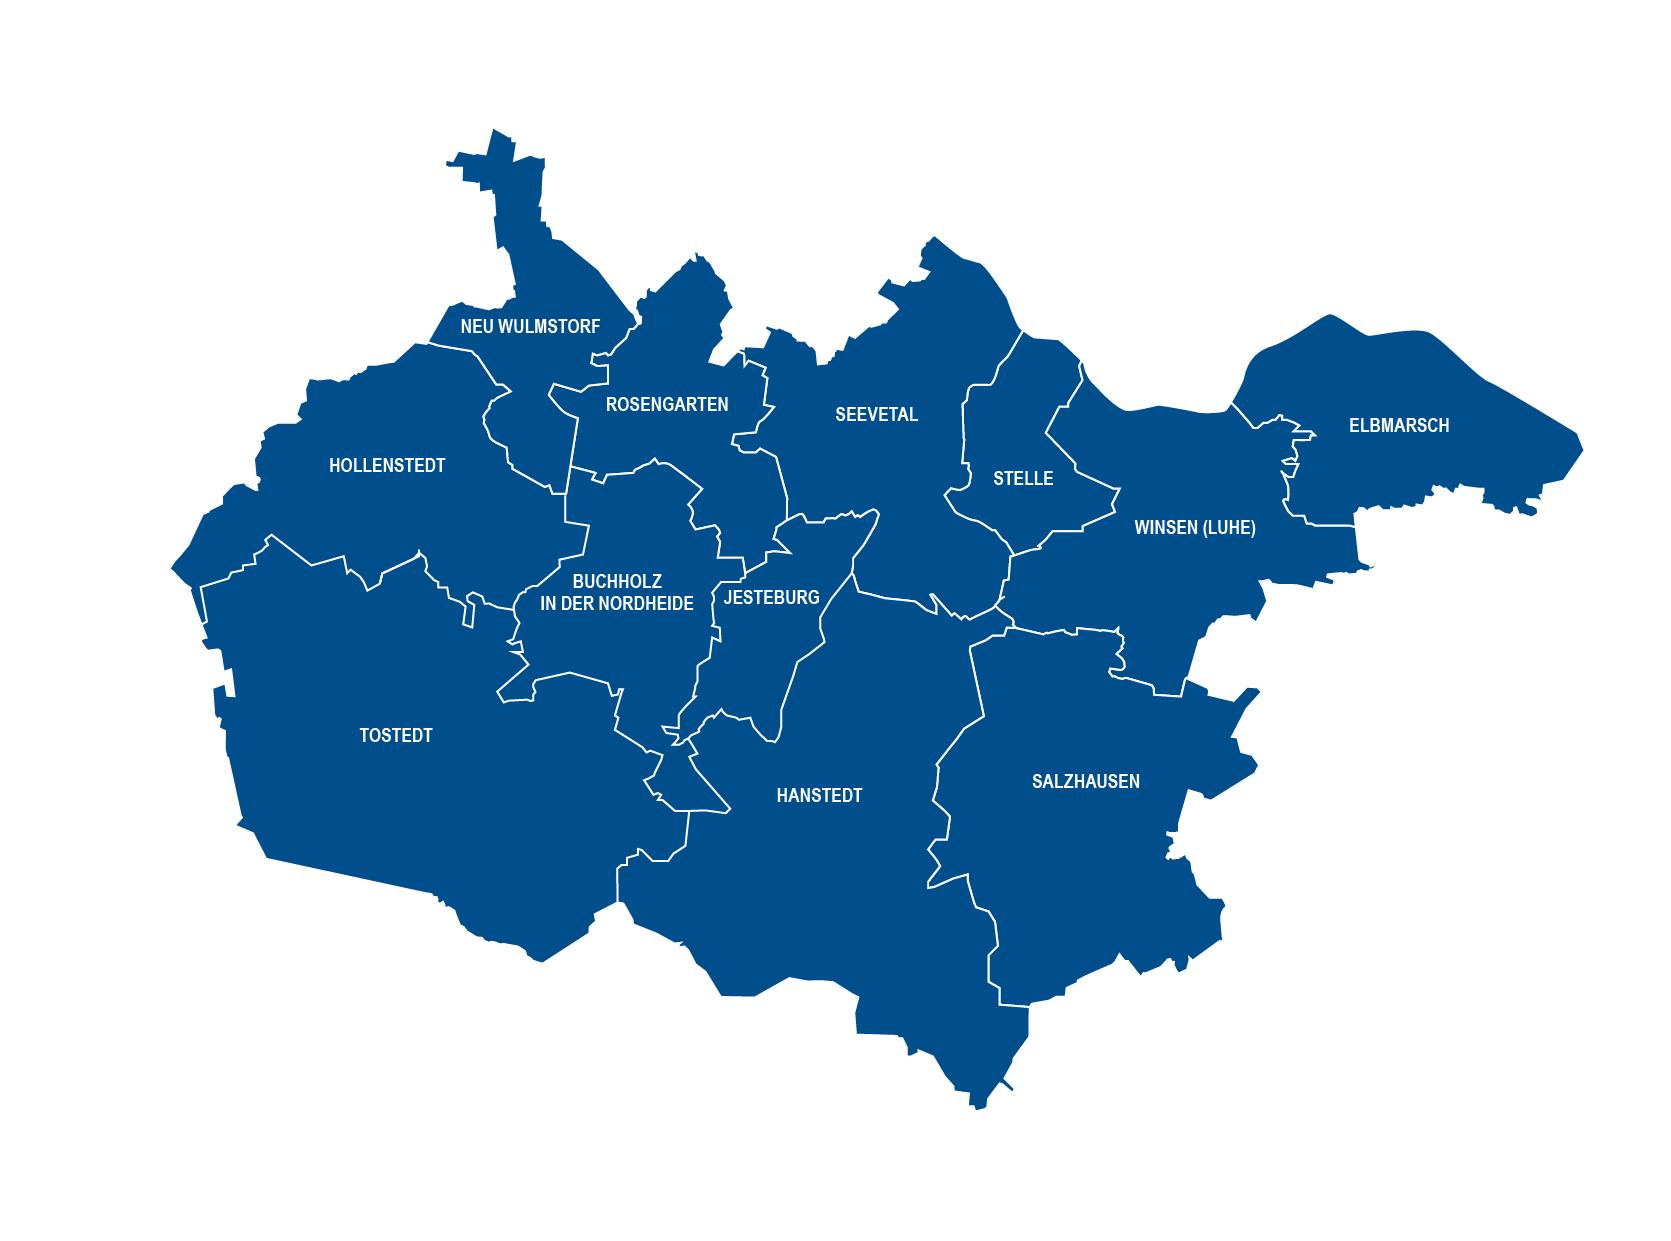 Immobilien Im Landkreis Harburg Nordheide Immobilien Immobilienmakler Heide